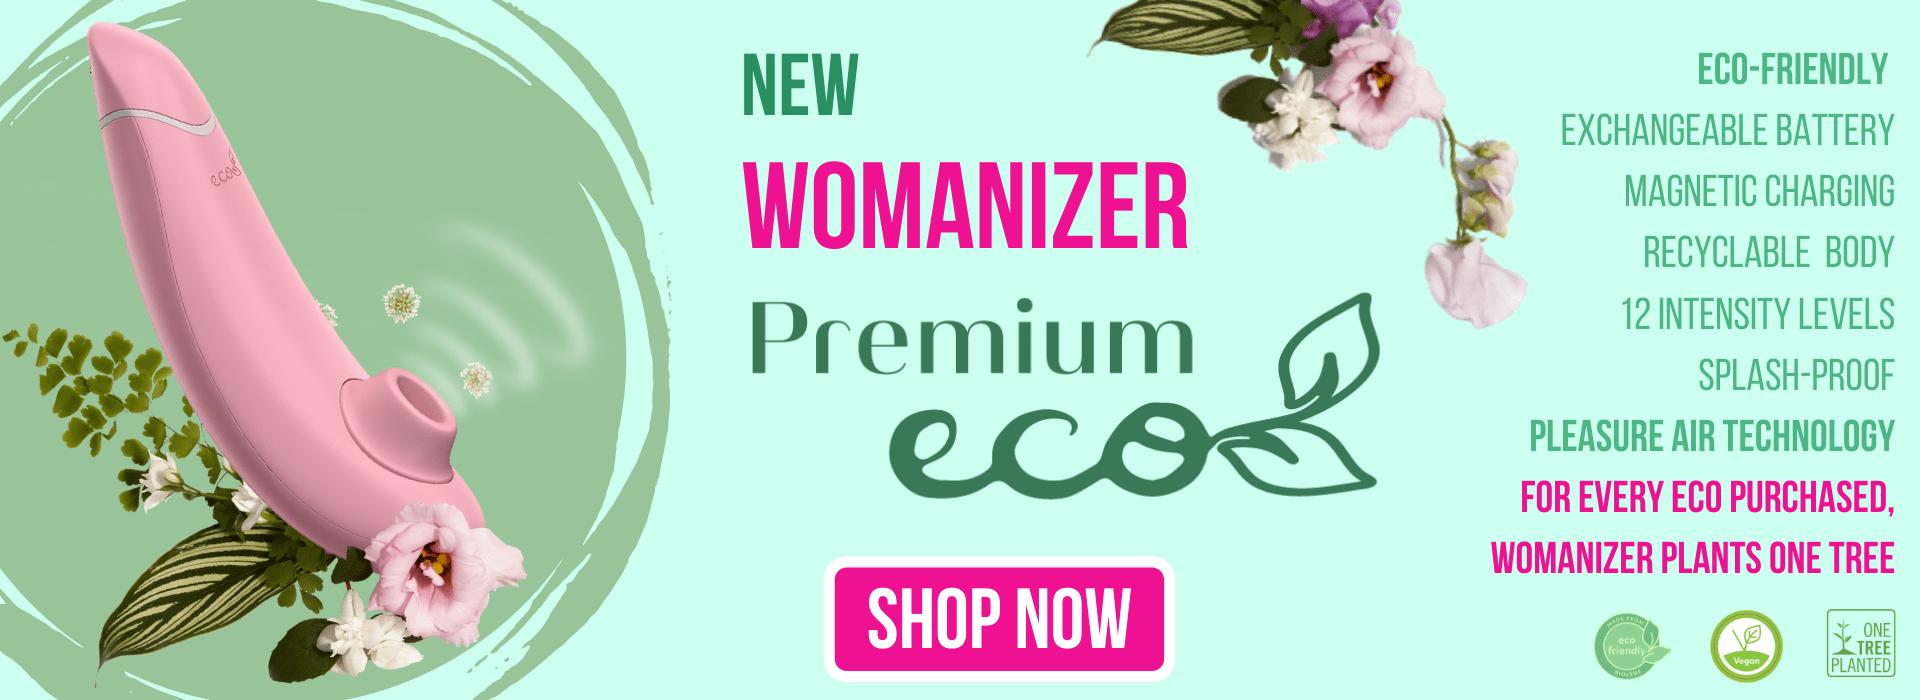 Womanizer Premium Eco